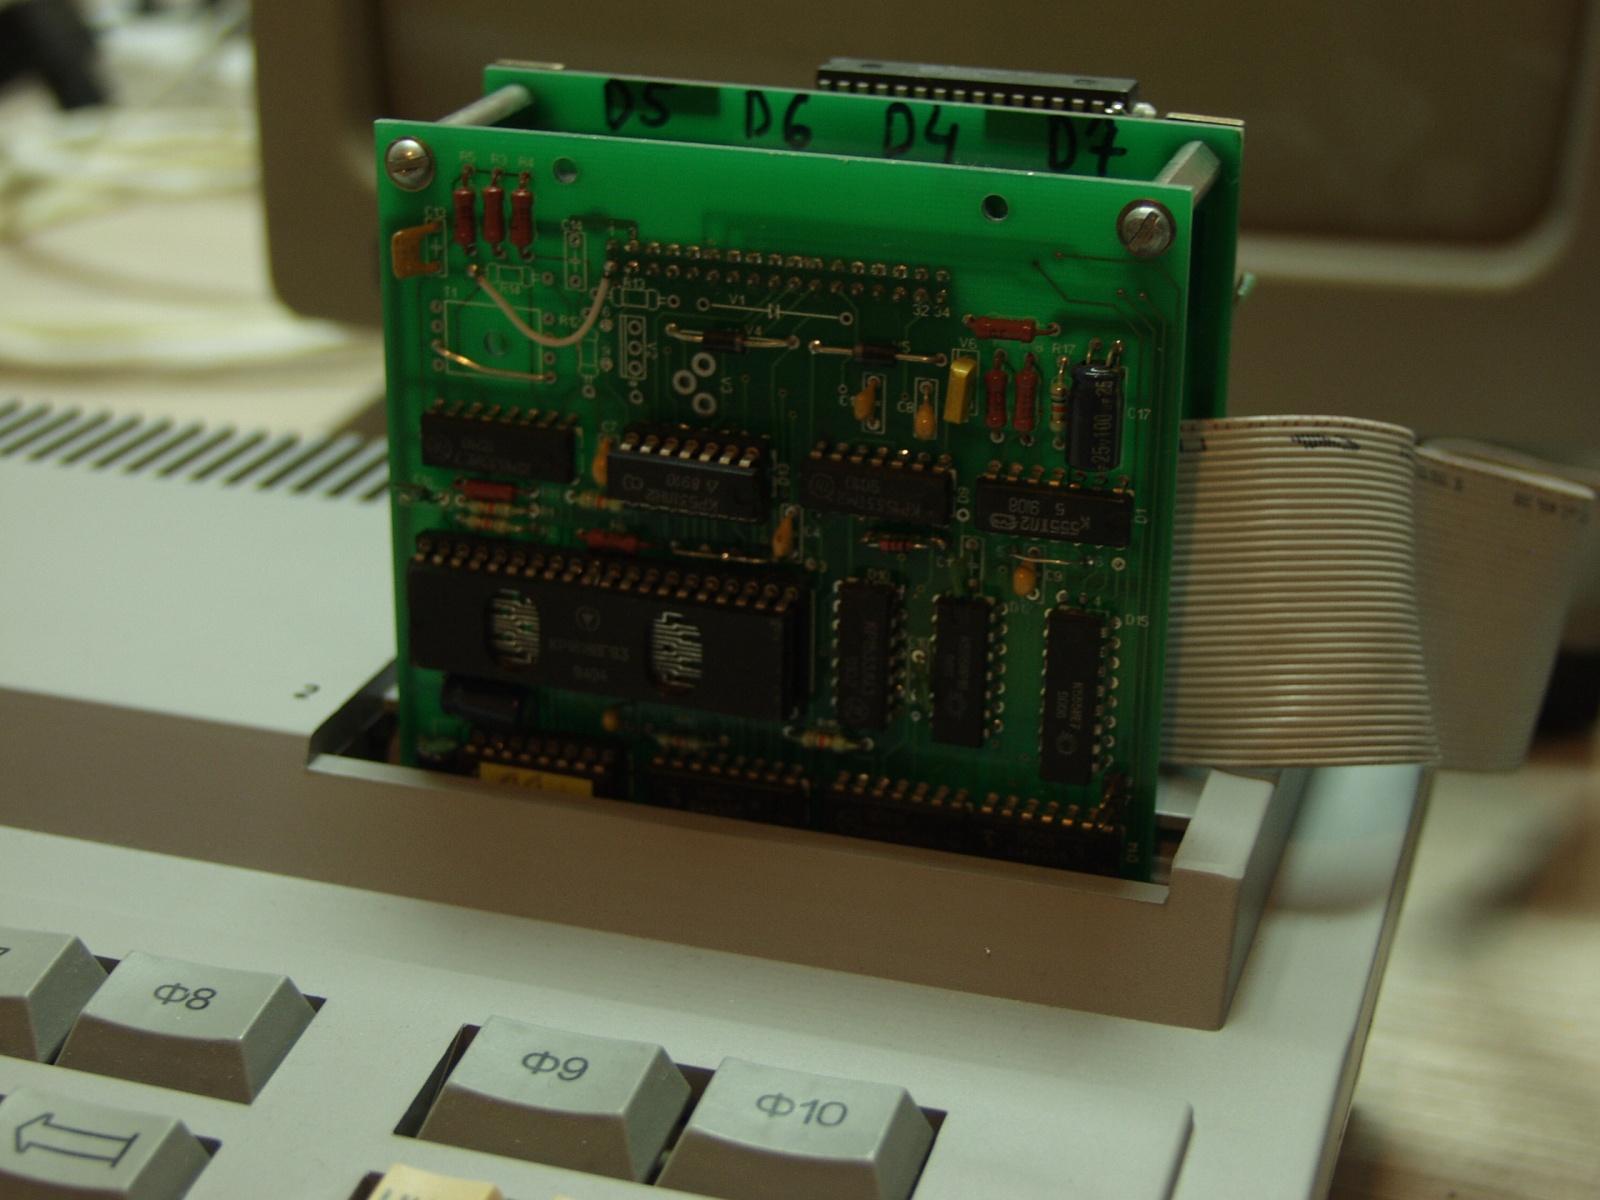 Советская IBM-PC Электроника МС-1502 - 9